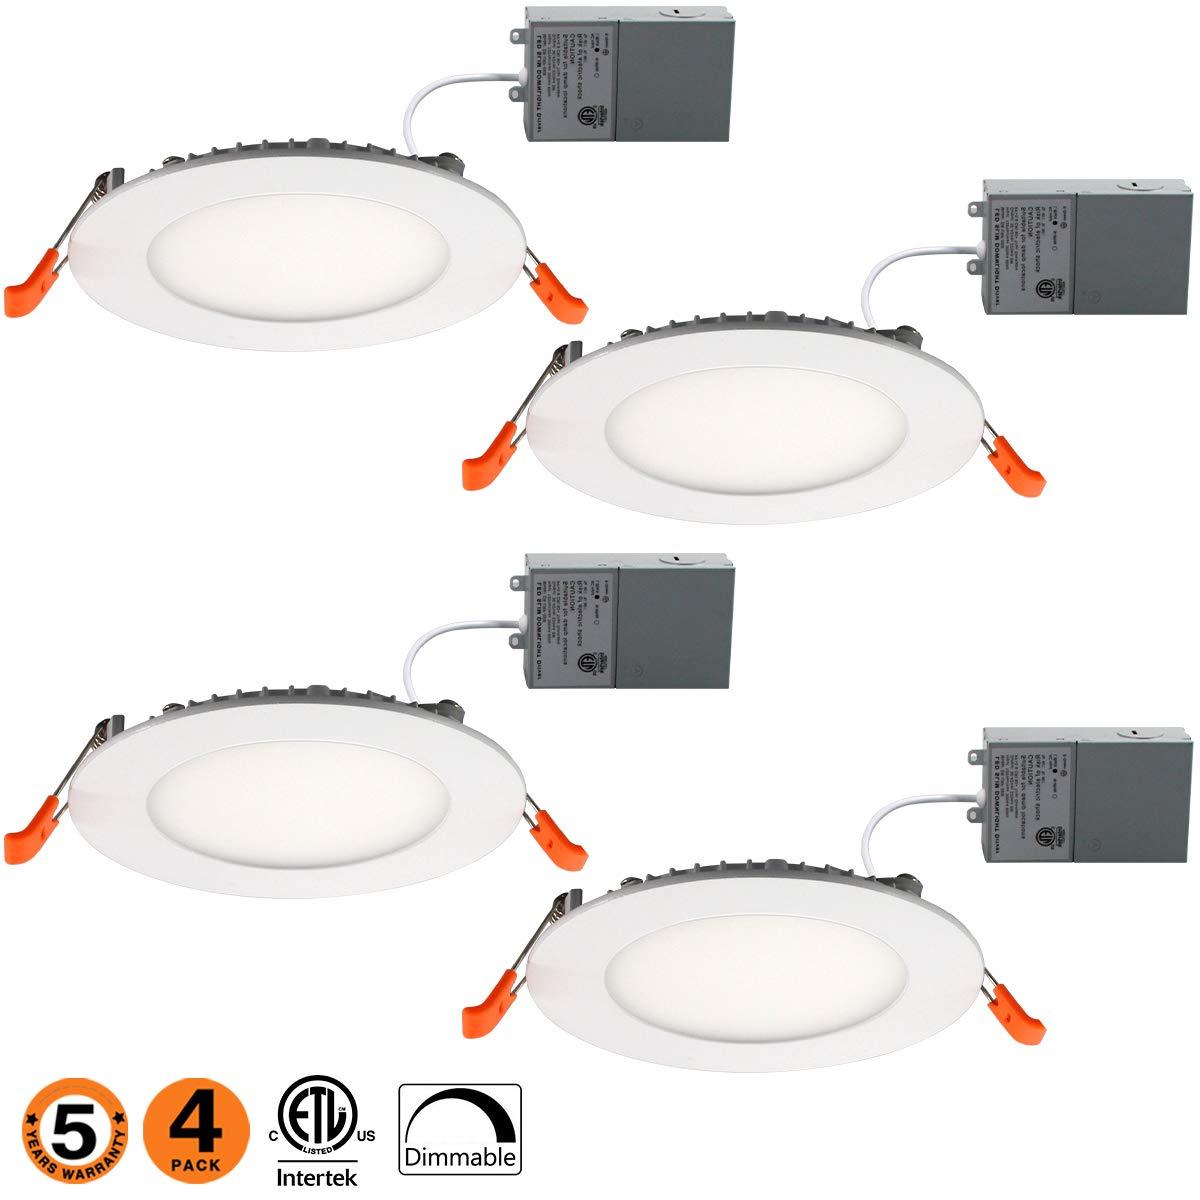 Slim Led Downlight 4 Inch 9W Dimmable (65W Equivalent) ETL Listed 650LM 5000K Junction Box Recessed Lighting E-4PK-50k